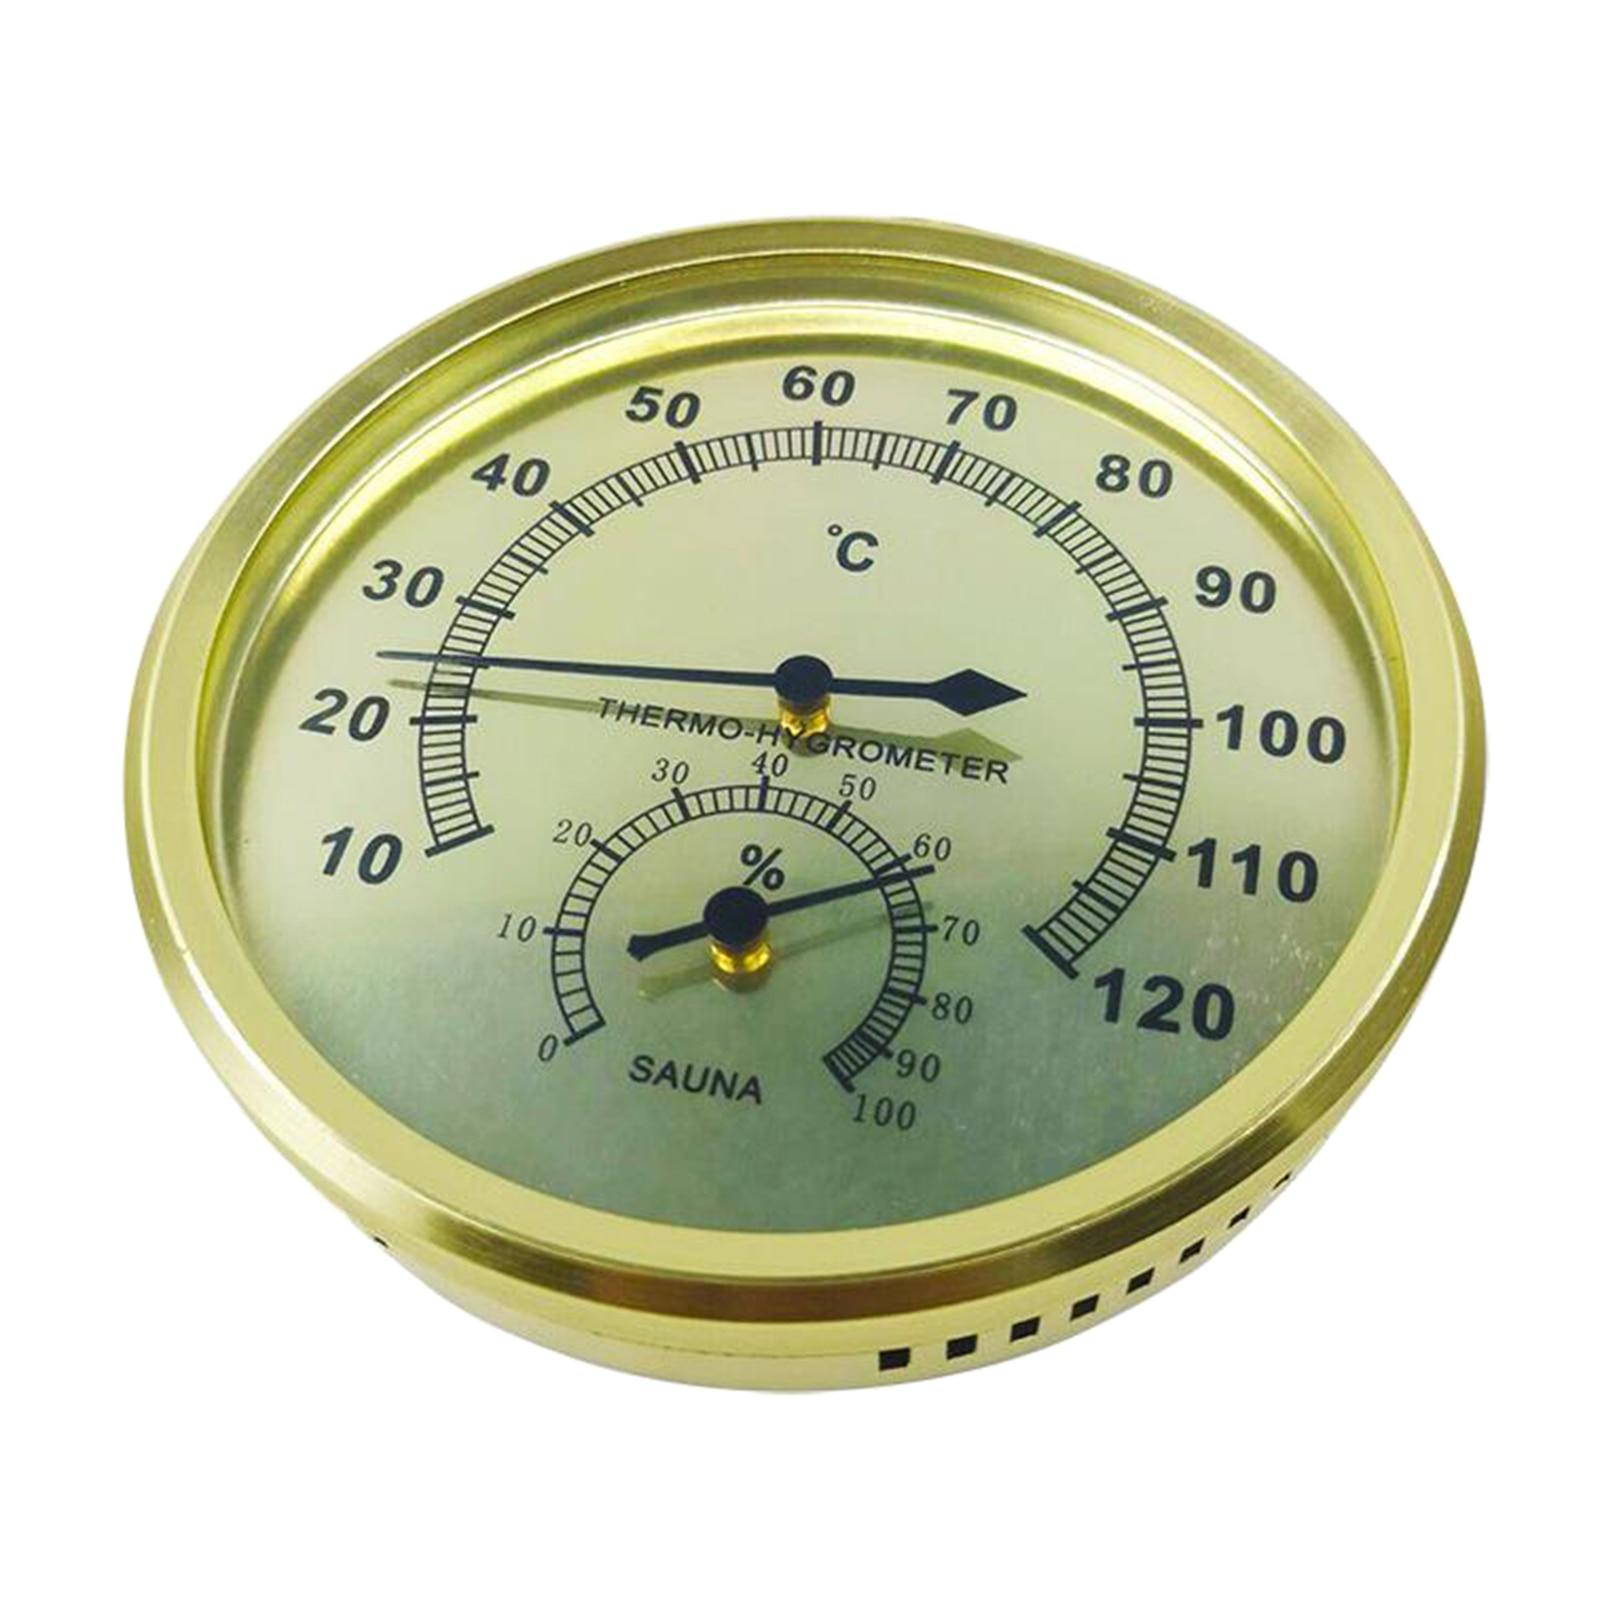 2 в 1, гигрометр-термометр для сауны